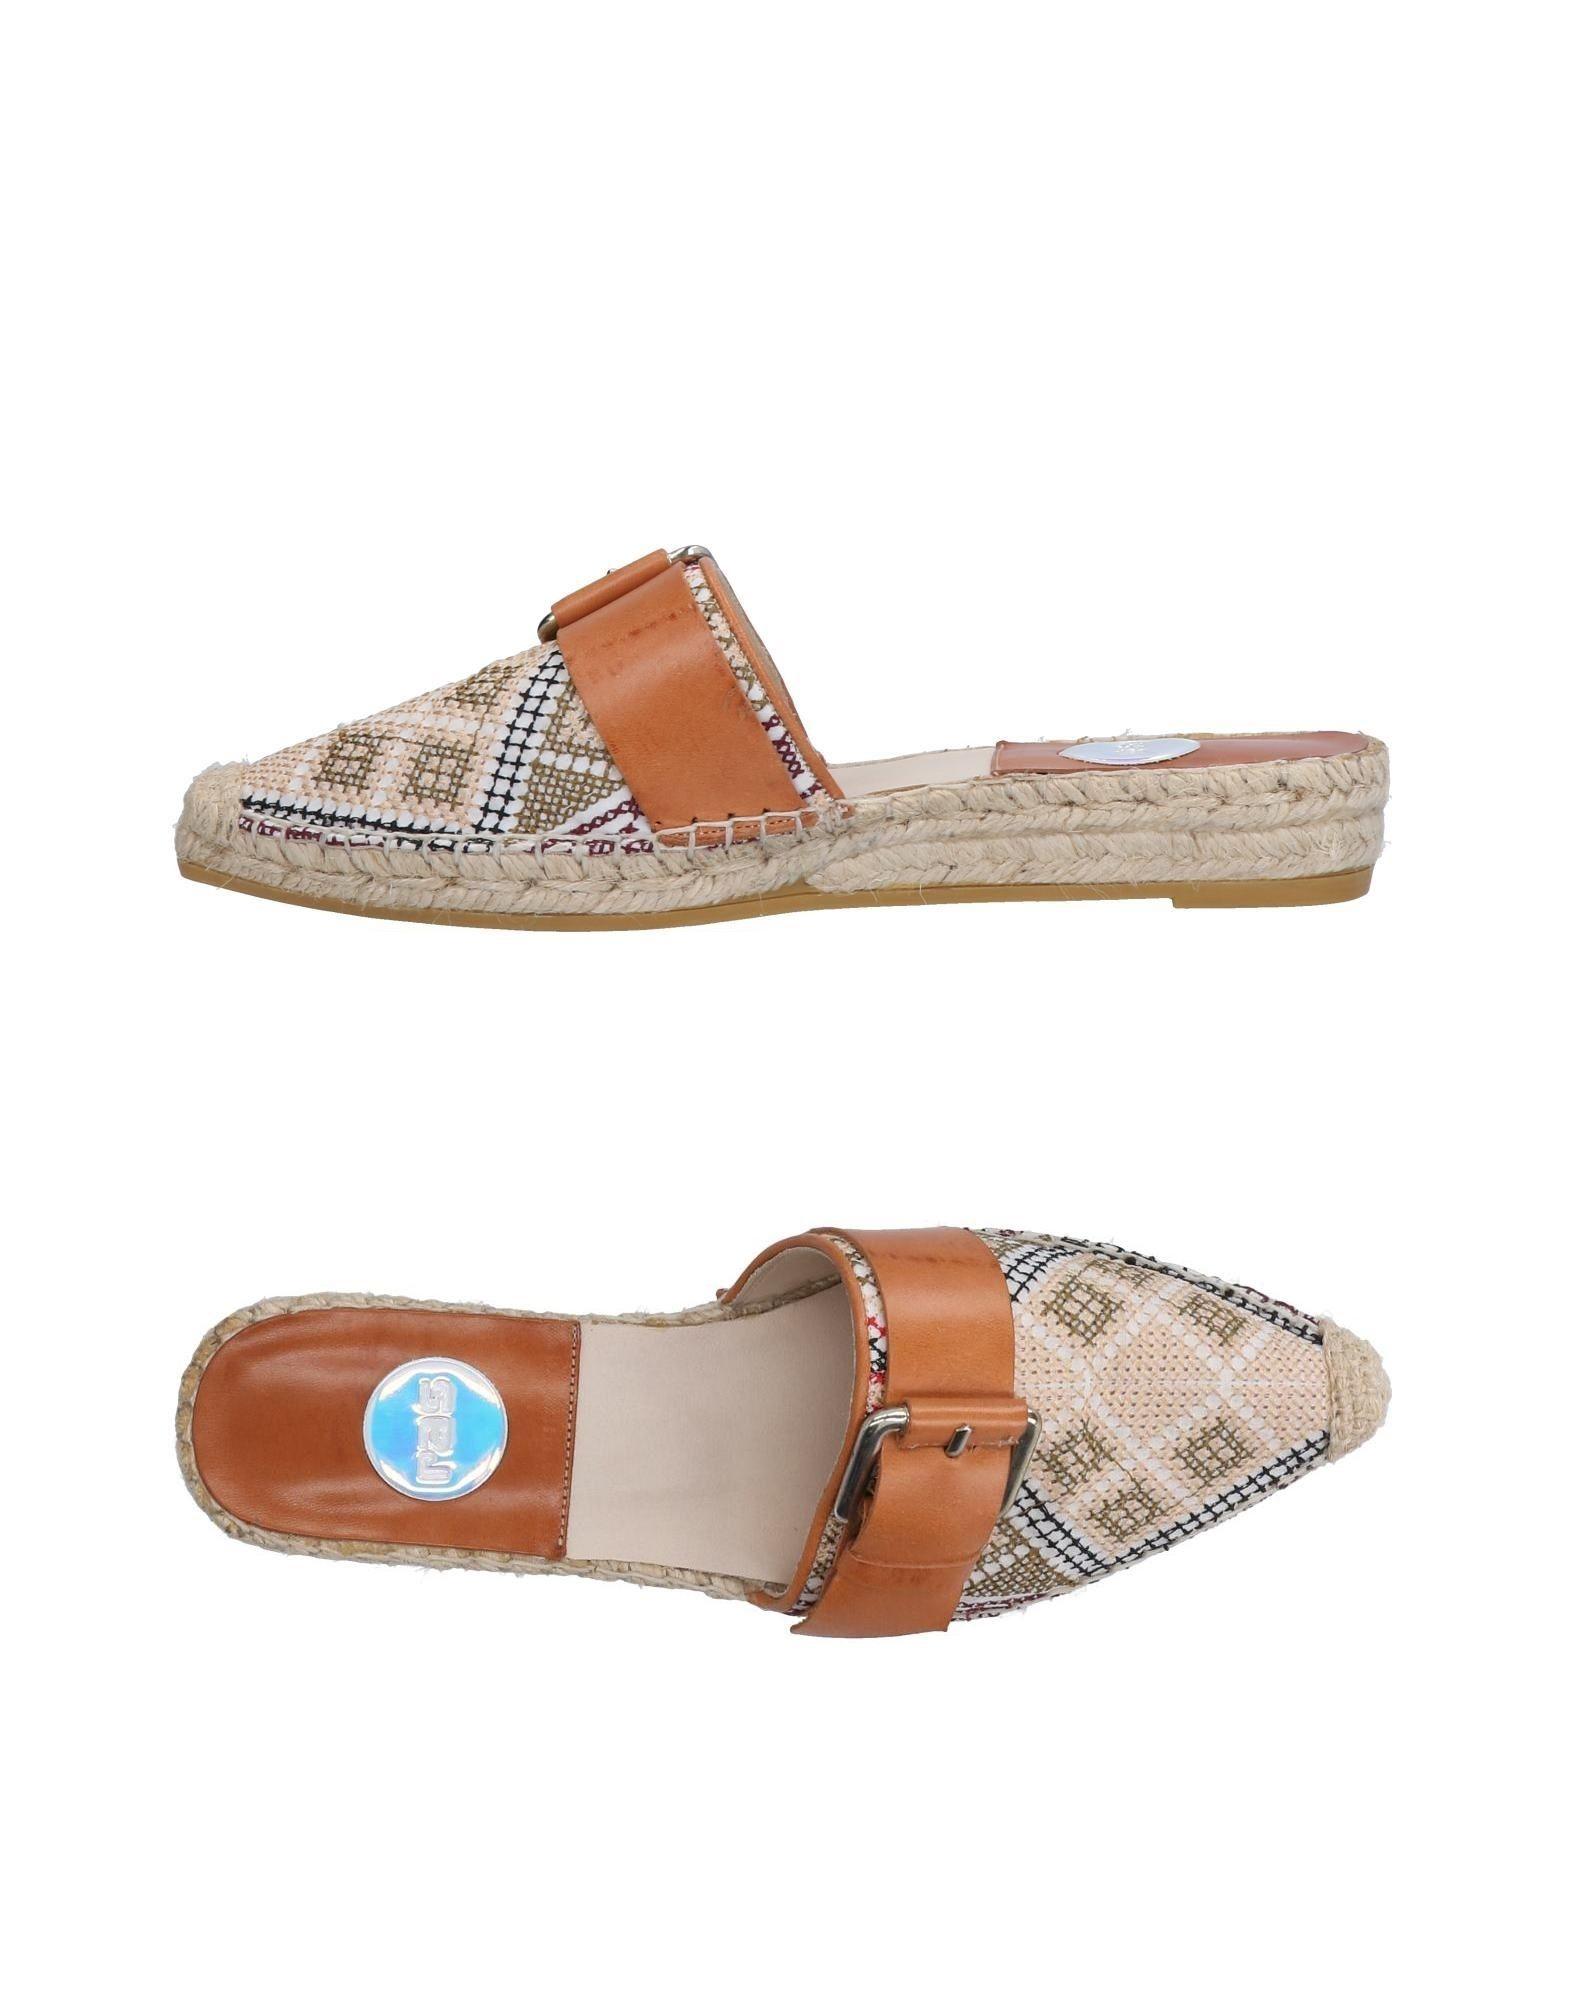 Ras Espadrilles Damen  11512056TQ Gute Qualität beliebte Schuhe